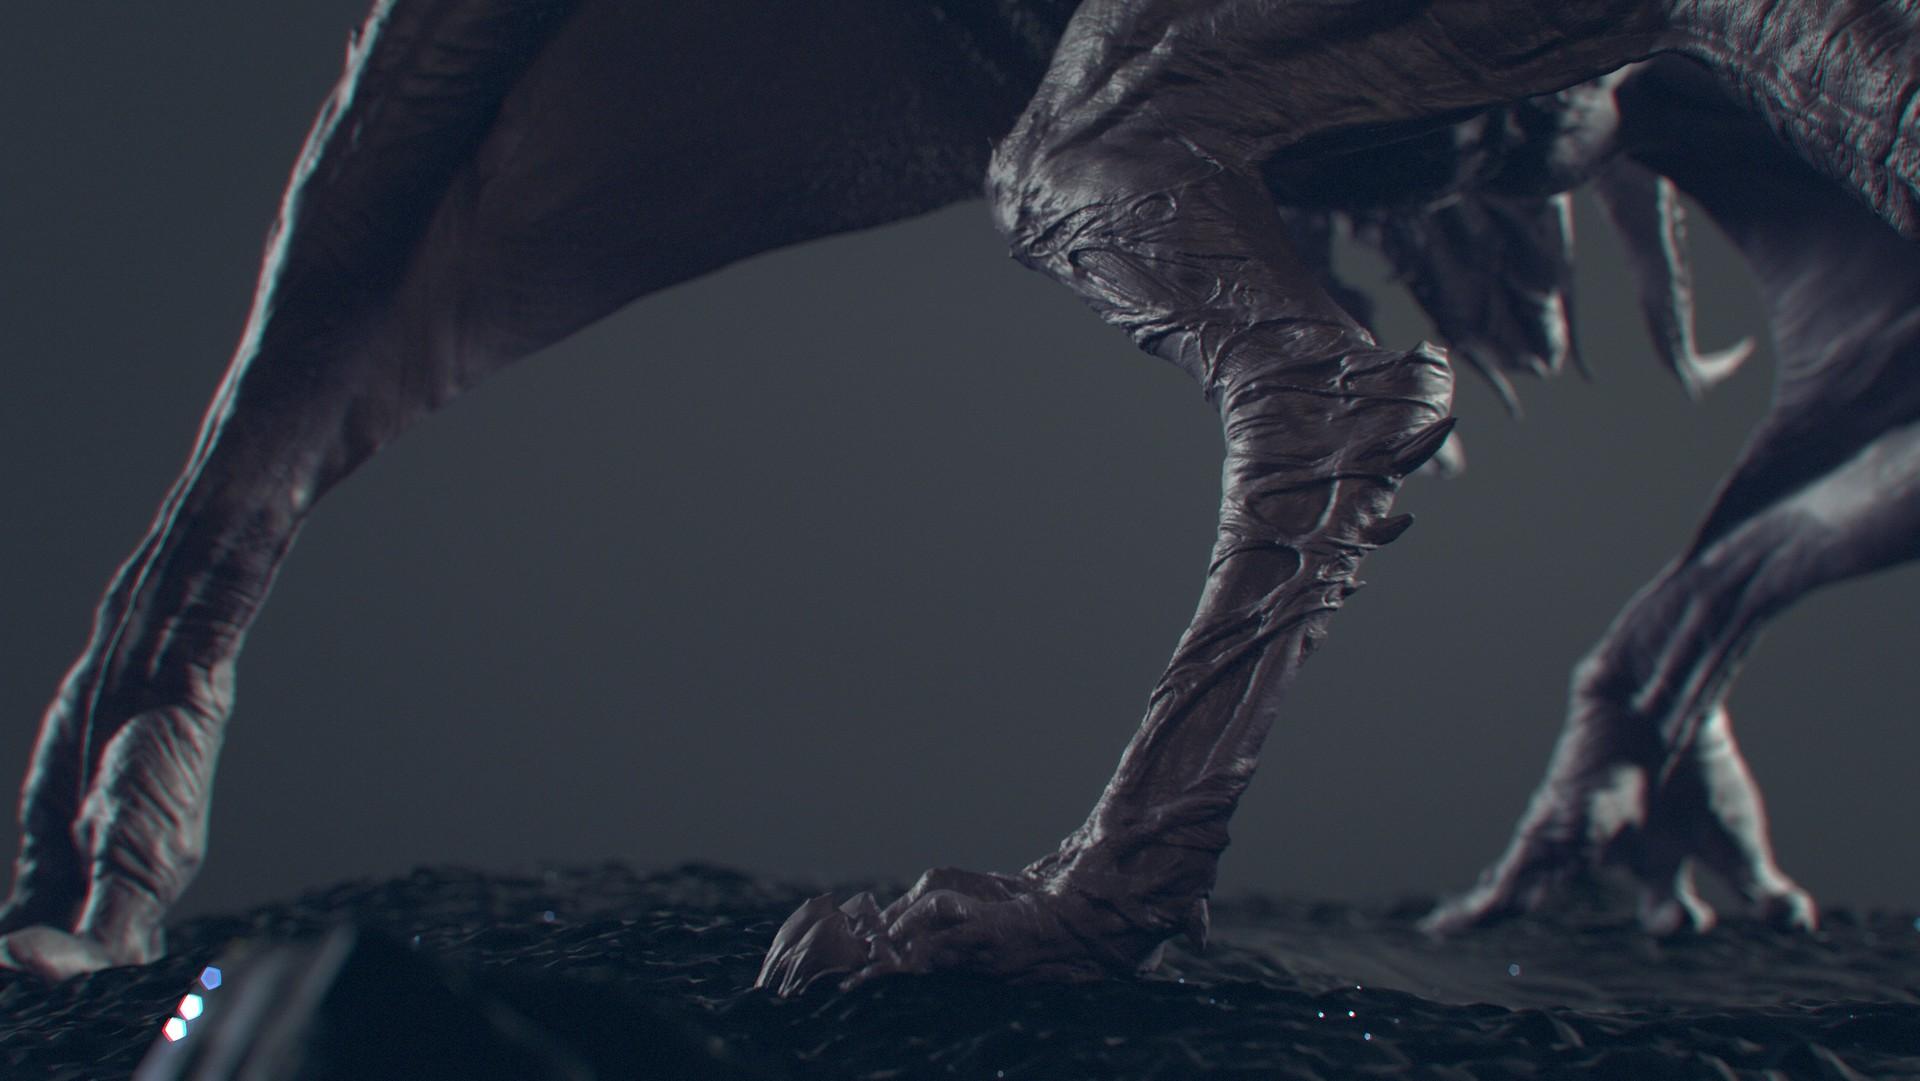 Abner marin tdt crimsoncreature foot am 01